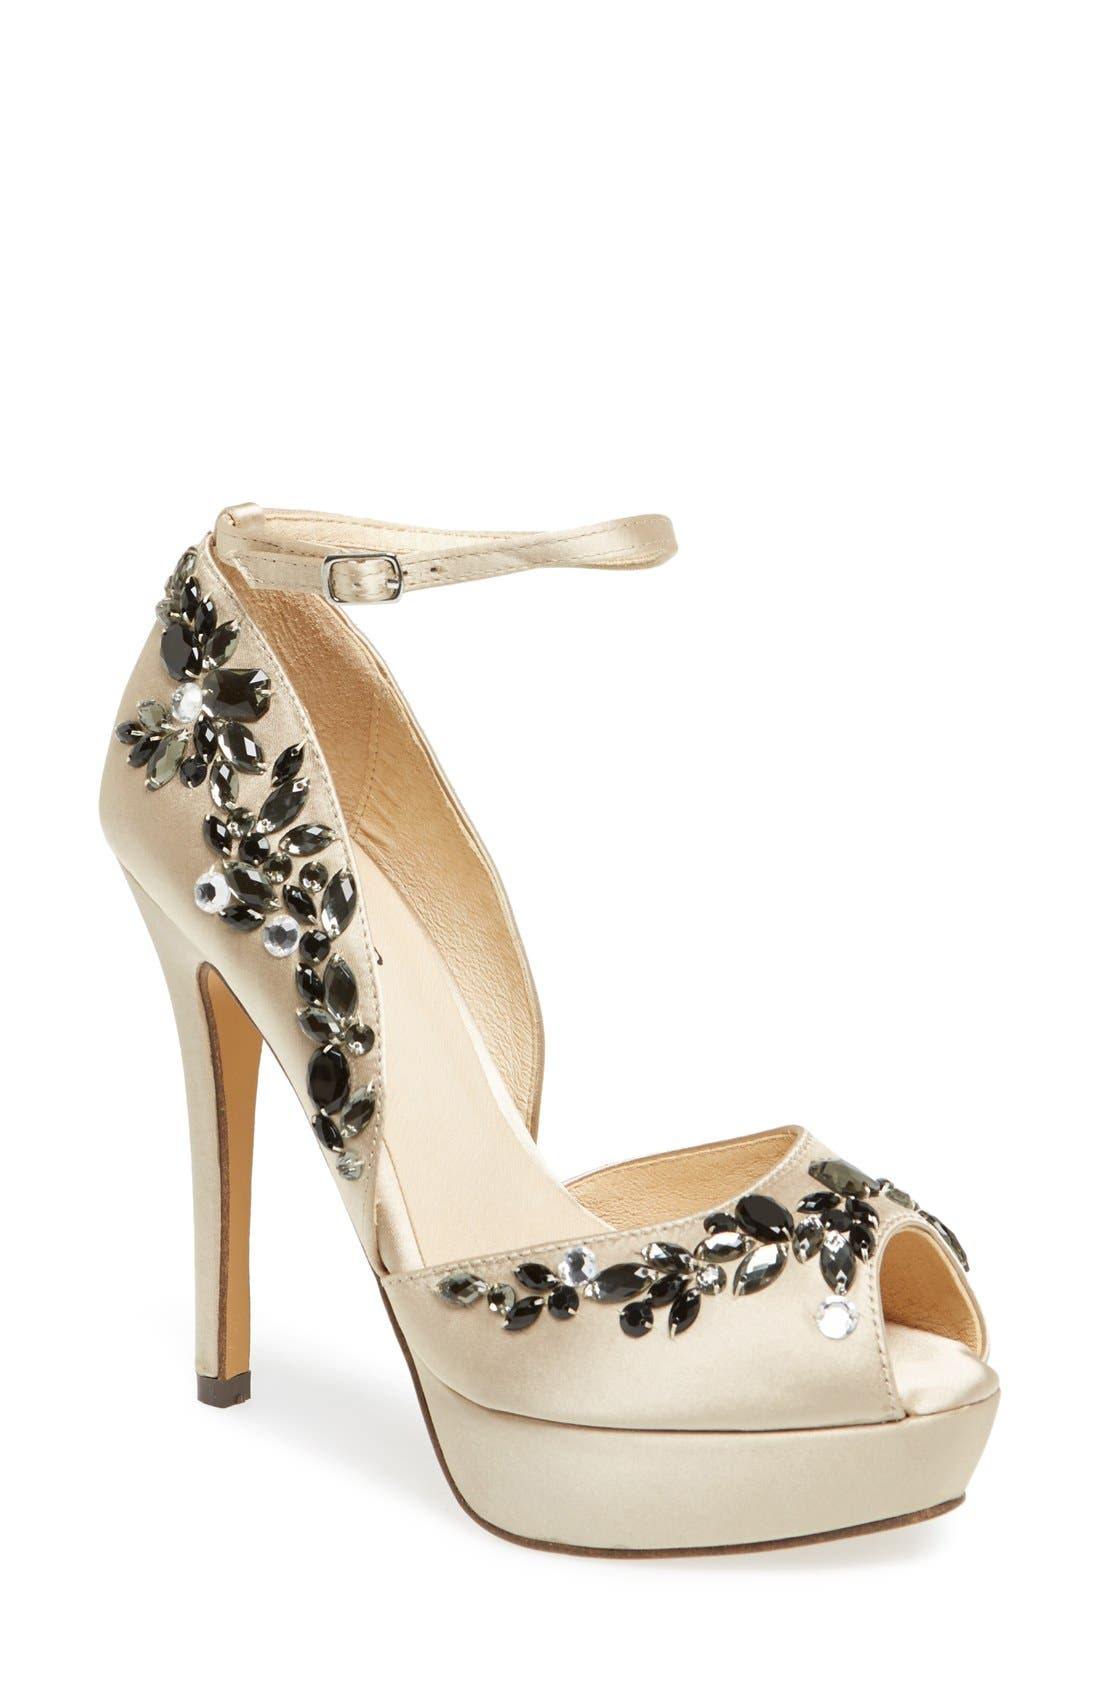 Main Image - Menbur 'D Olivet' Platform Ankle Strap Sandal (Women)